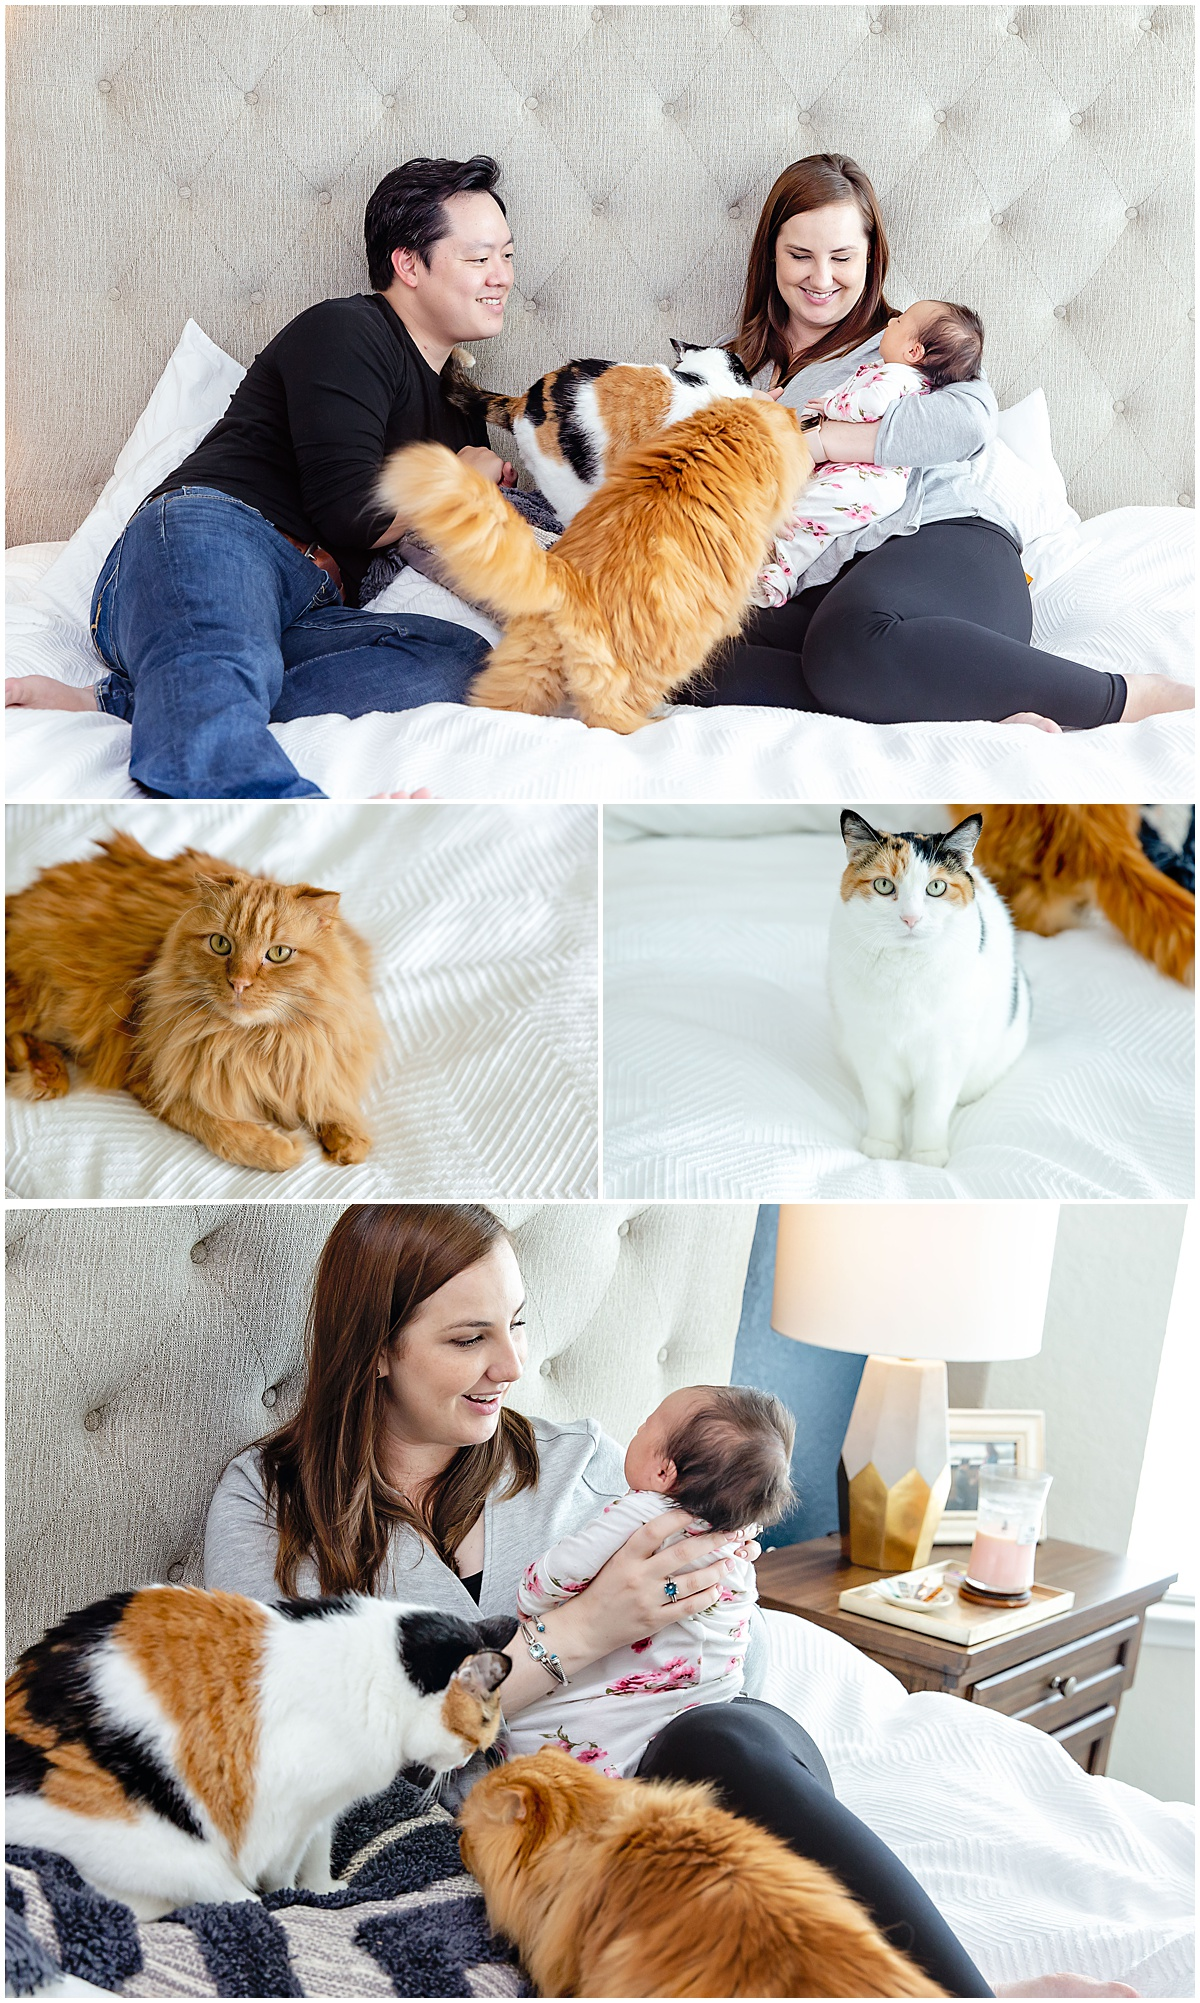 Lifestyle-newborn-family-photos-san-antonio-texas-carly-barton-photography_0005.jpg